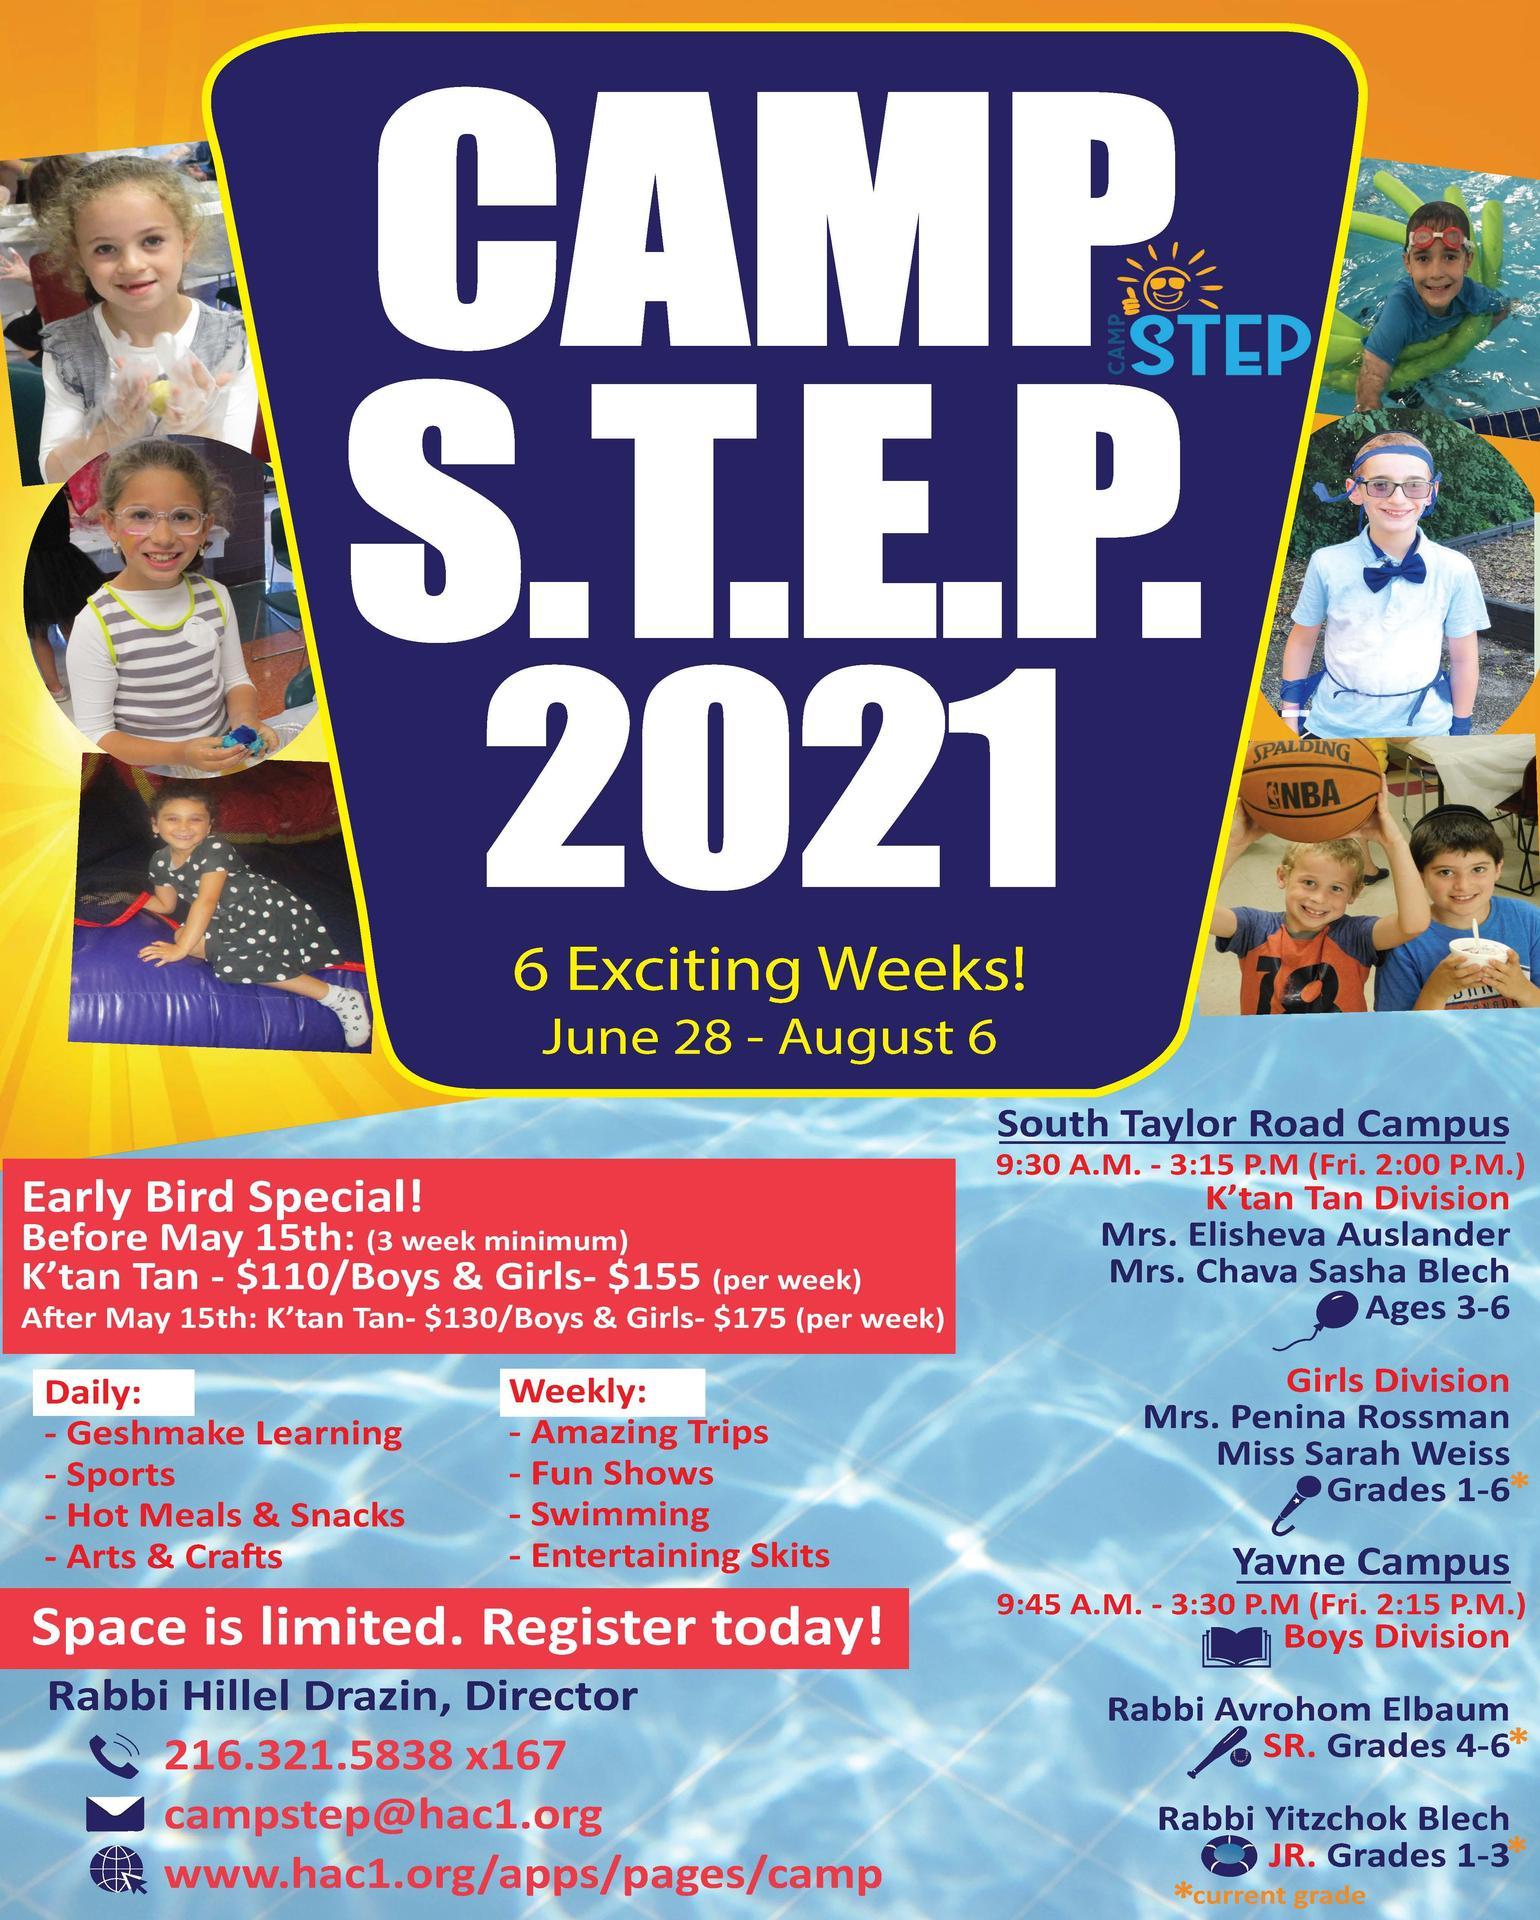 Camp STEP